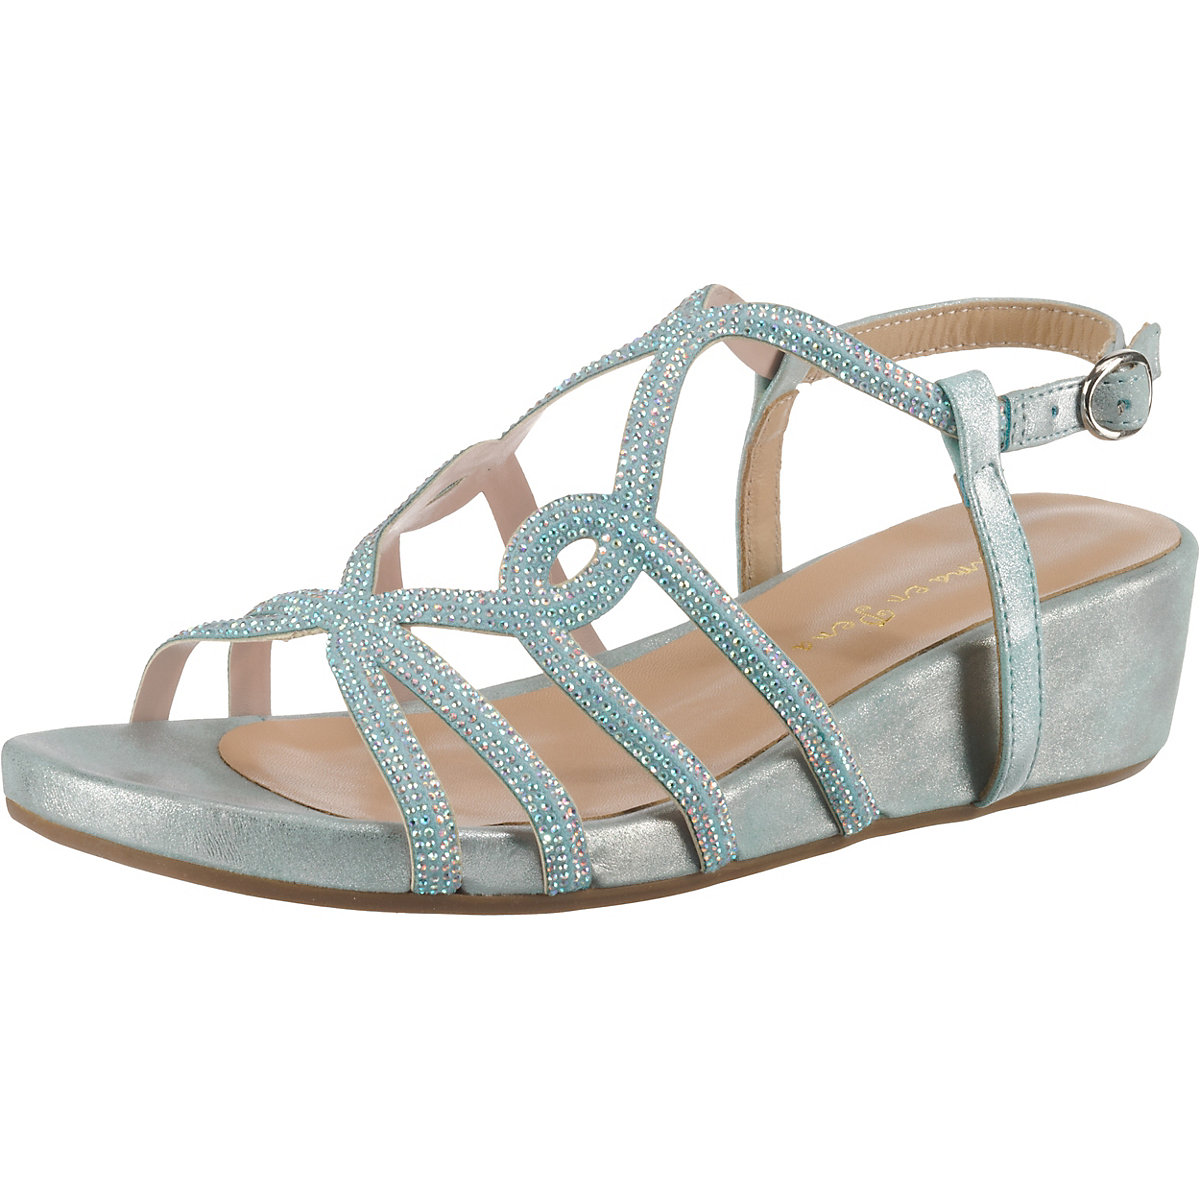 Alma en Pena, Klassische Sandaletten, hellblau  Gute Qualität beliebte Schuhe